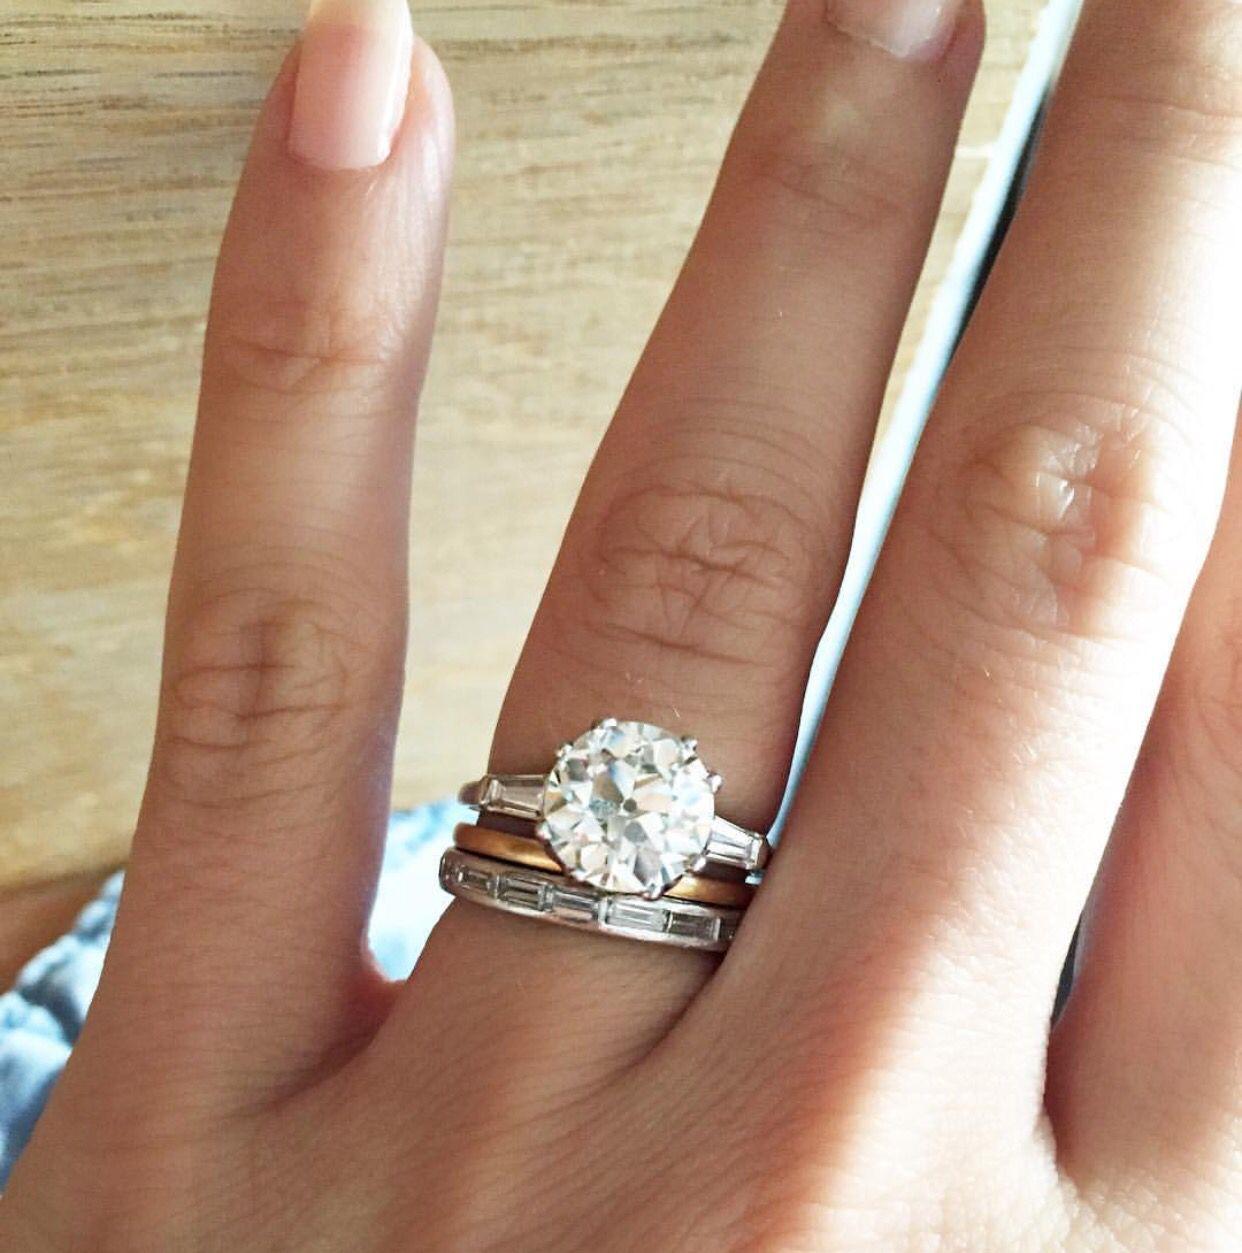 2 Carat Engagement Ring Wedding Rings Vintage Diamond: Best Looking 2 Carat Wedding Rings At Websimilar.org